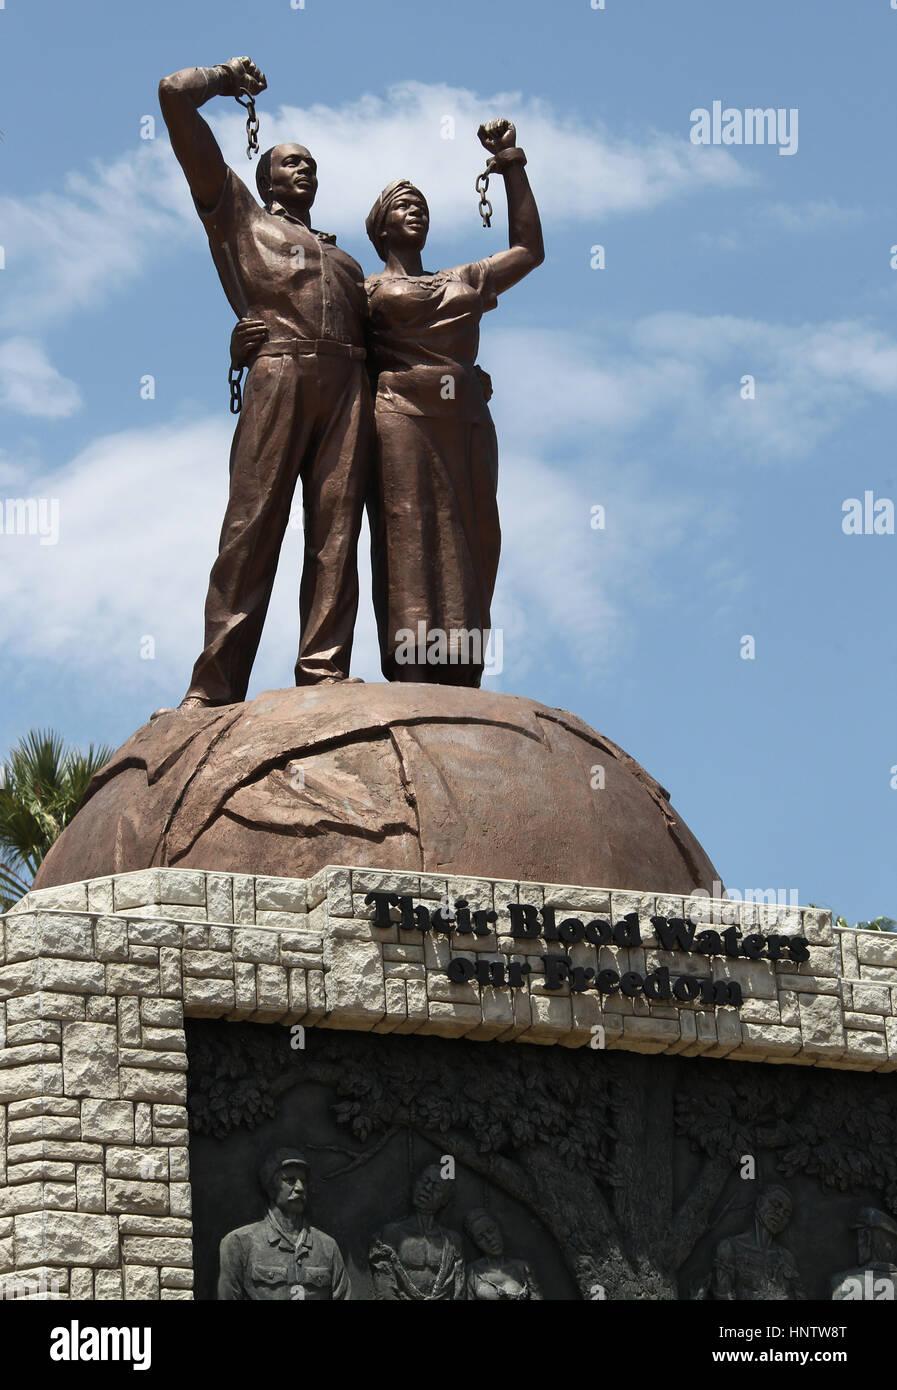 Genocide memorial at Windhoek in Namibia - Stock Image